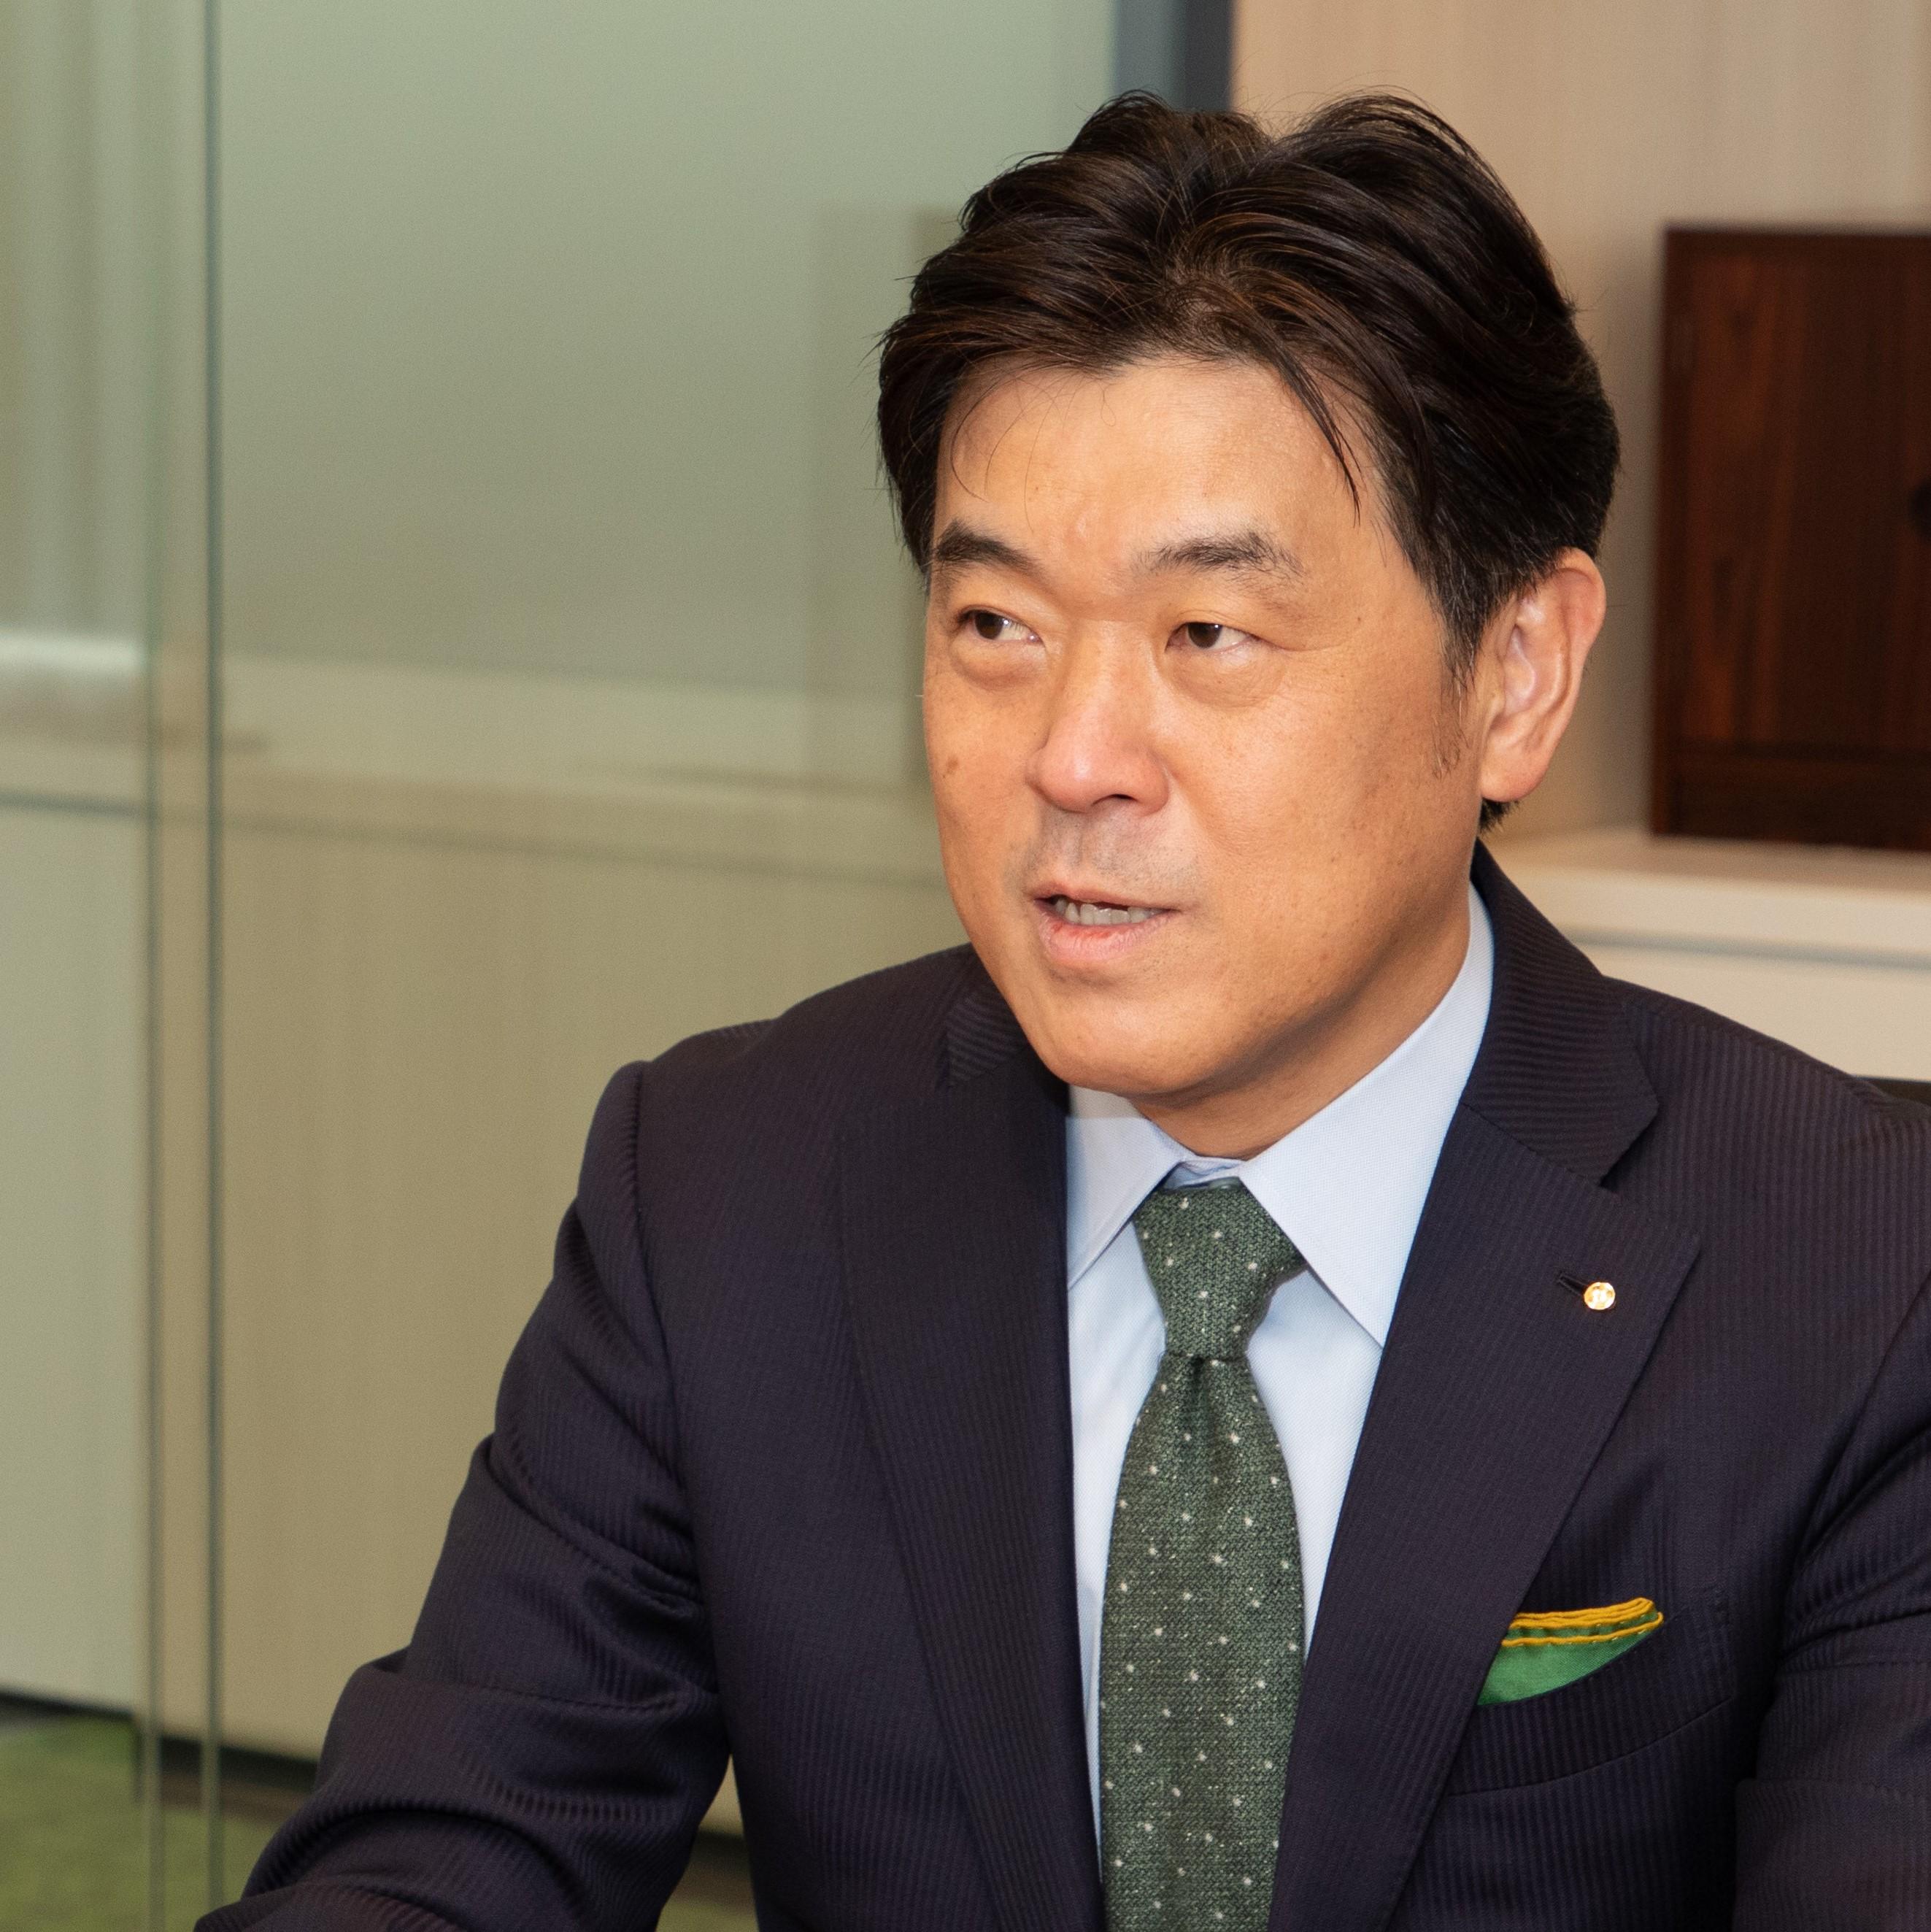 太陽ホールディングス株式会社 代表取締役社長 佐藤 英志 氏